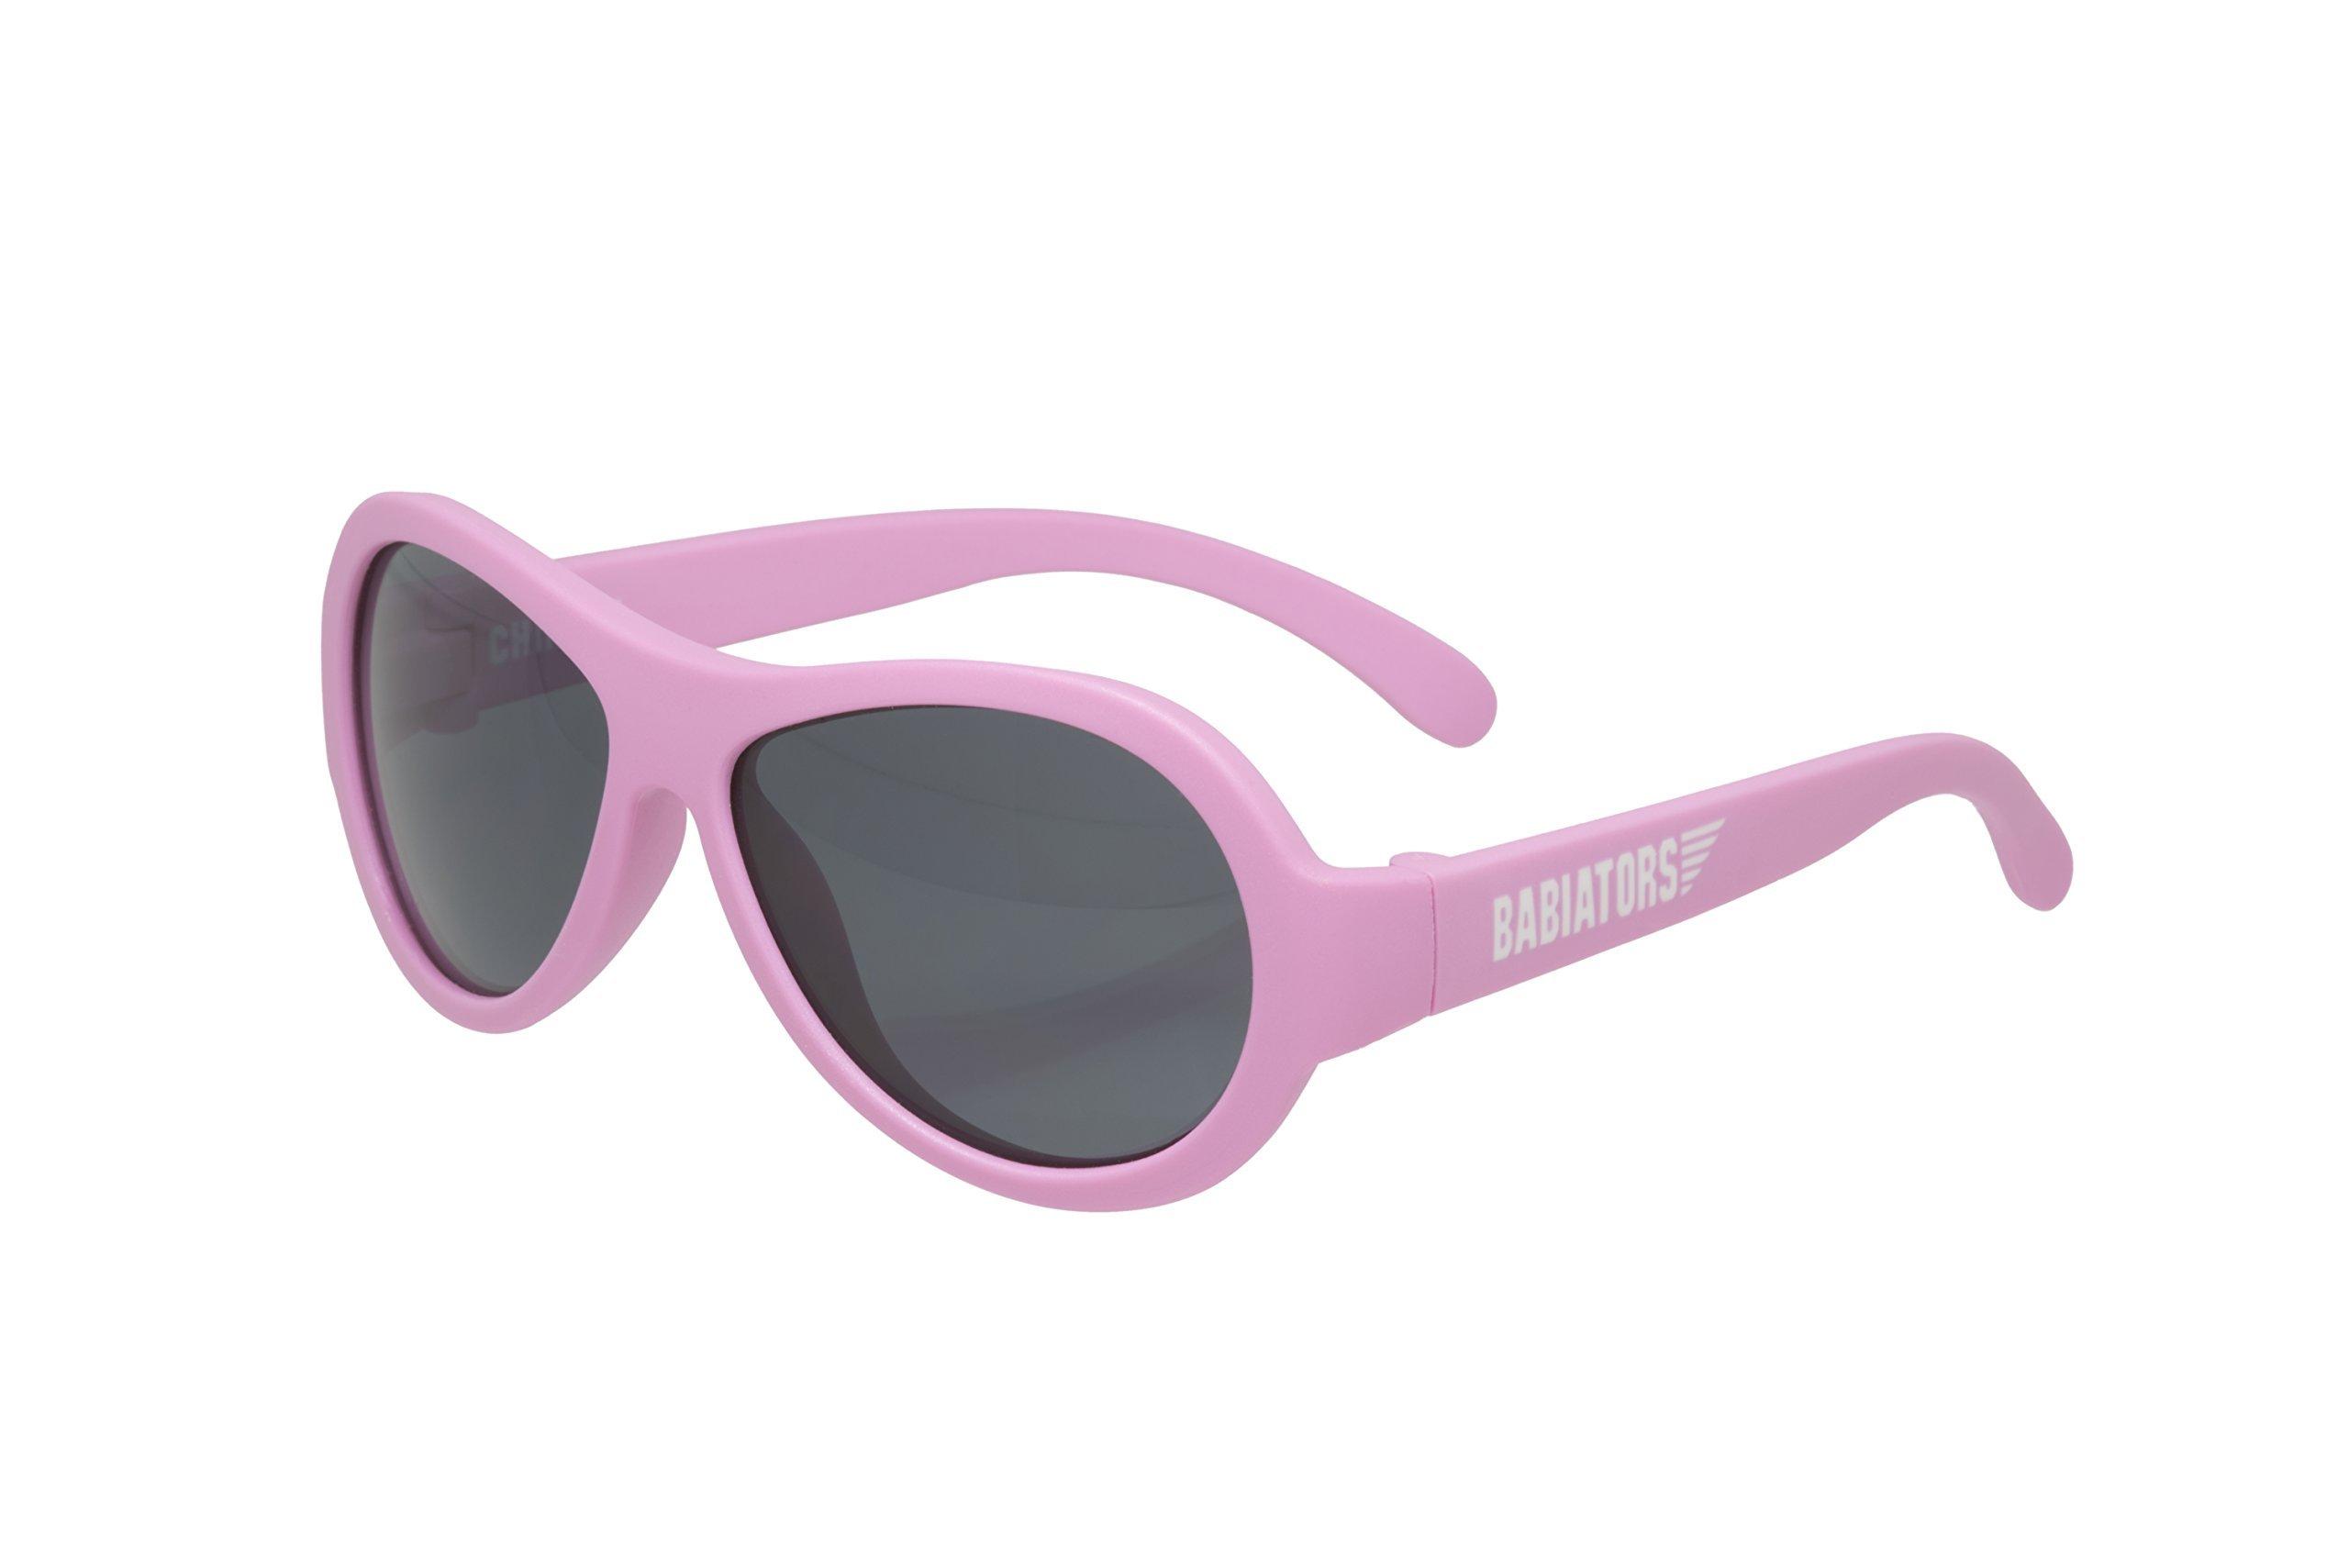 Babiators Original Aviator Sunglasses, Princess Pink Classic (3-5 years)